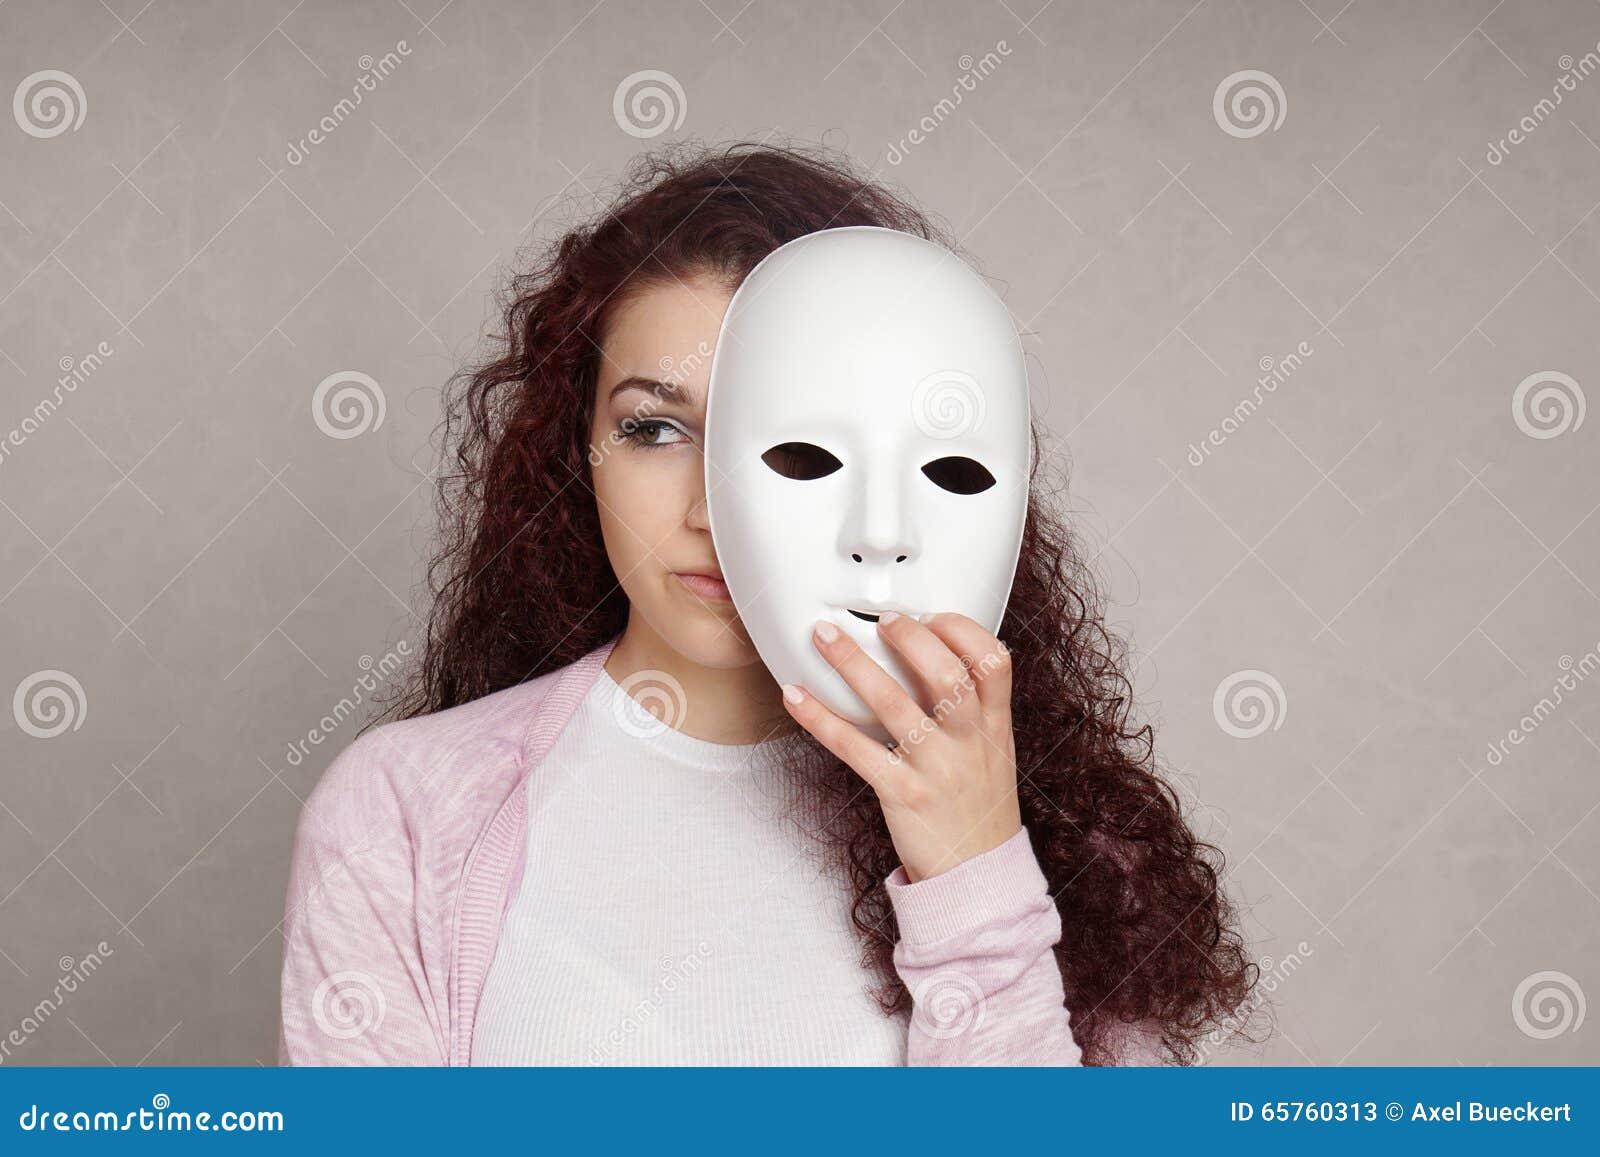 Sad Girl Hiding Behind Mask Stock Image - Image of illness ...